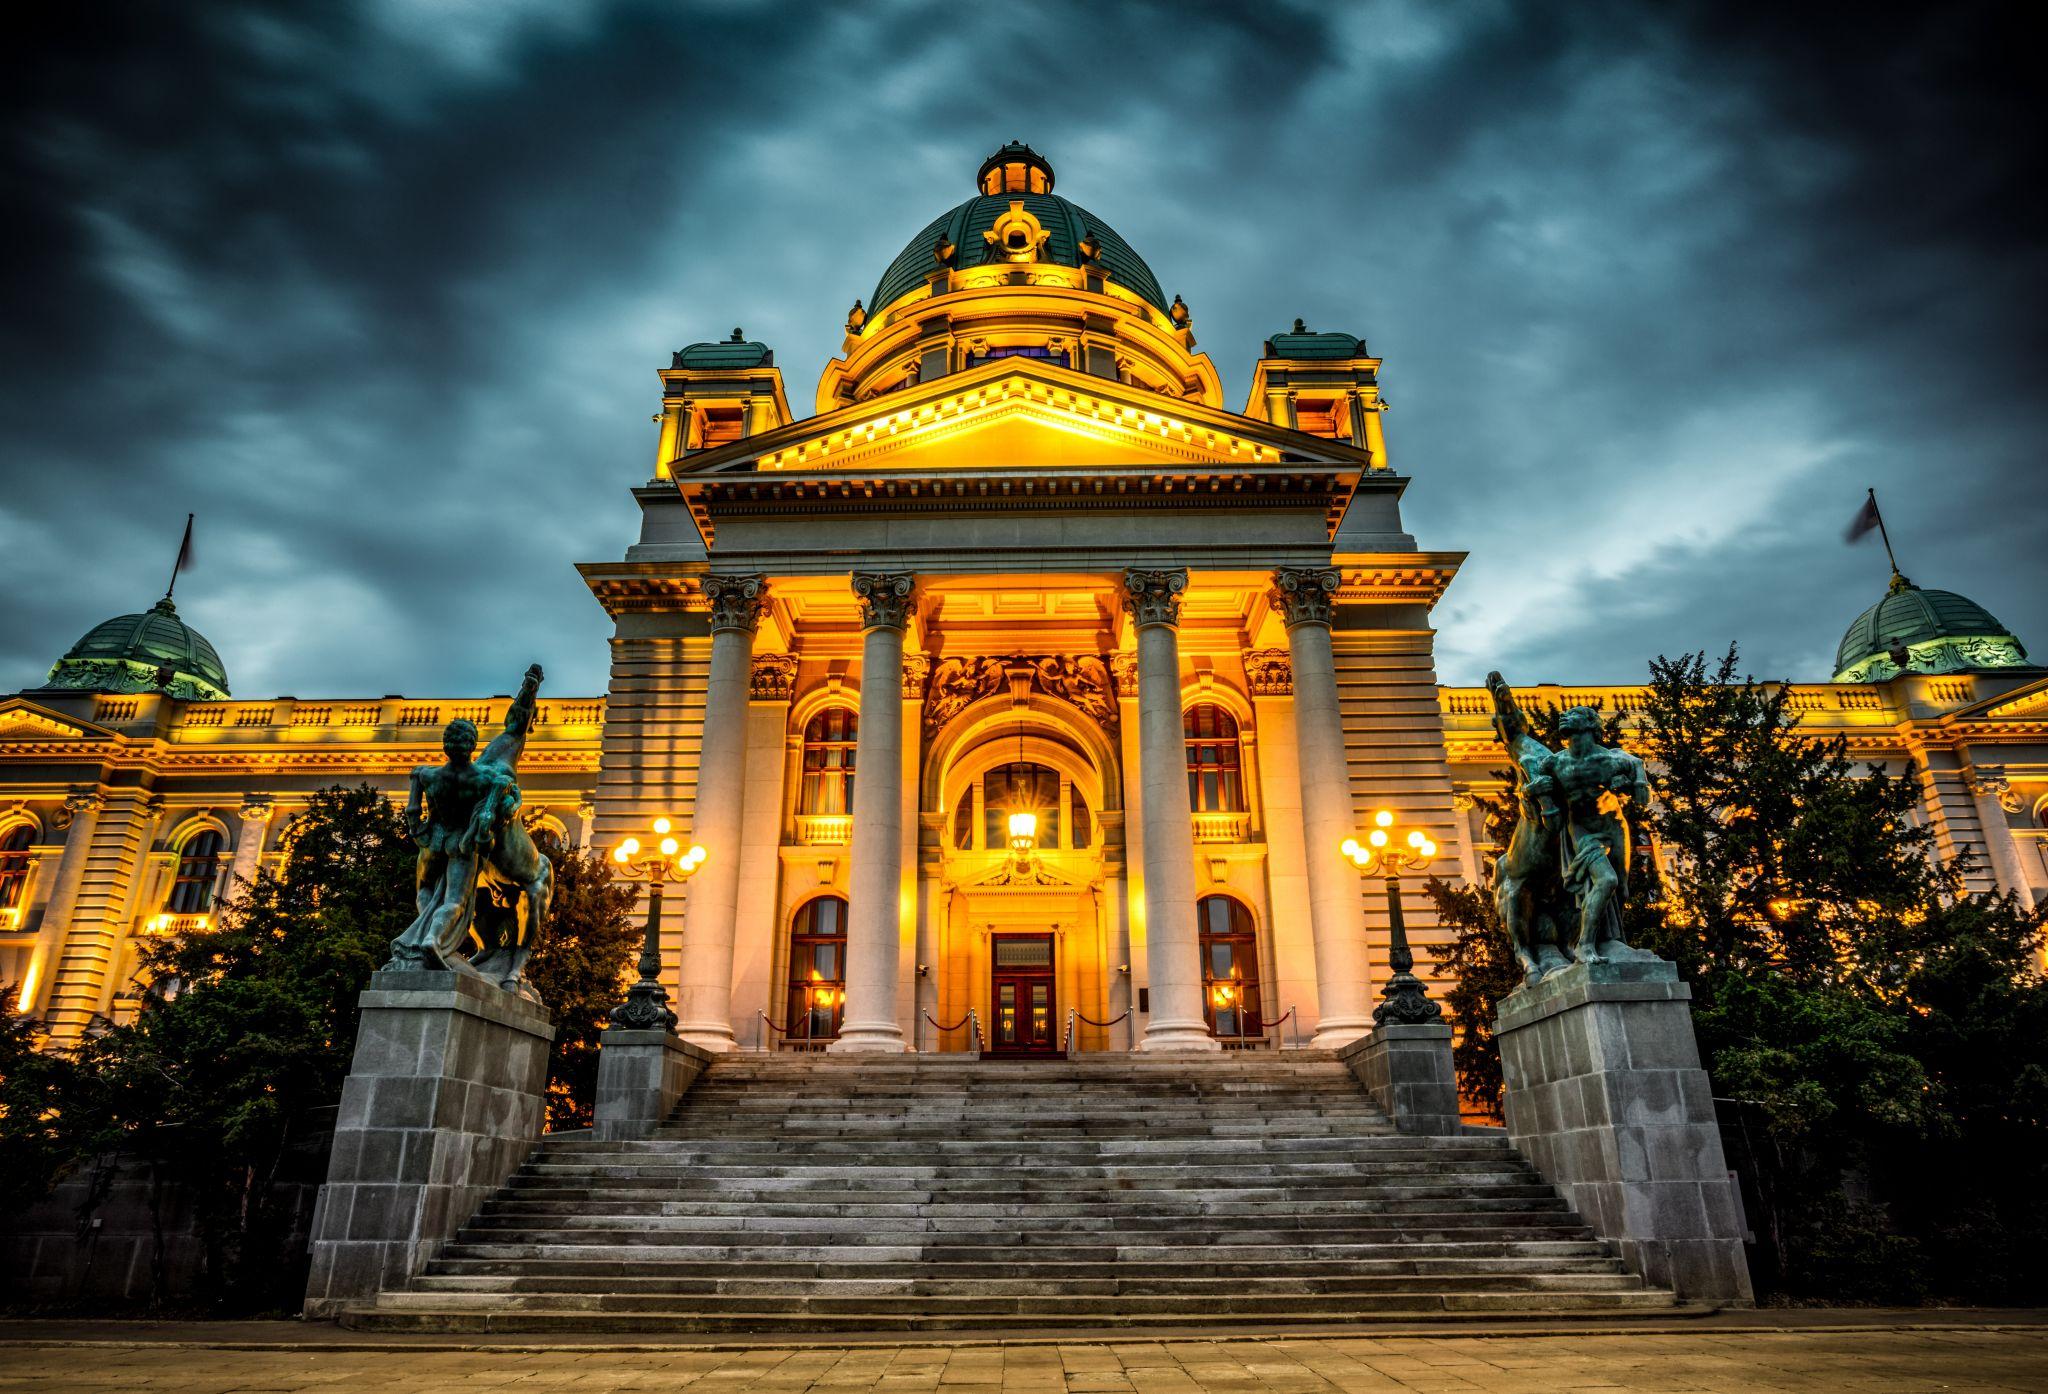 Belgrade Parliament Building, Serbia